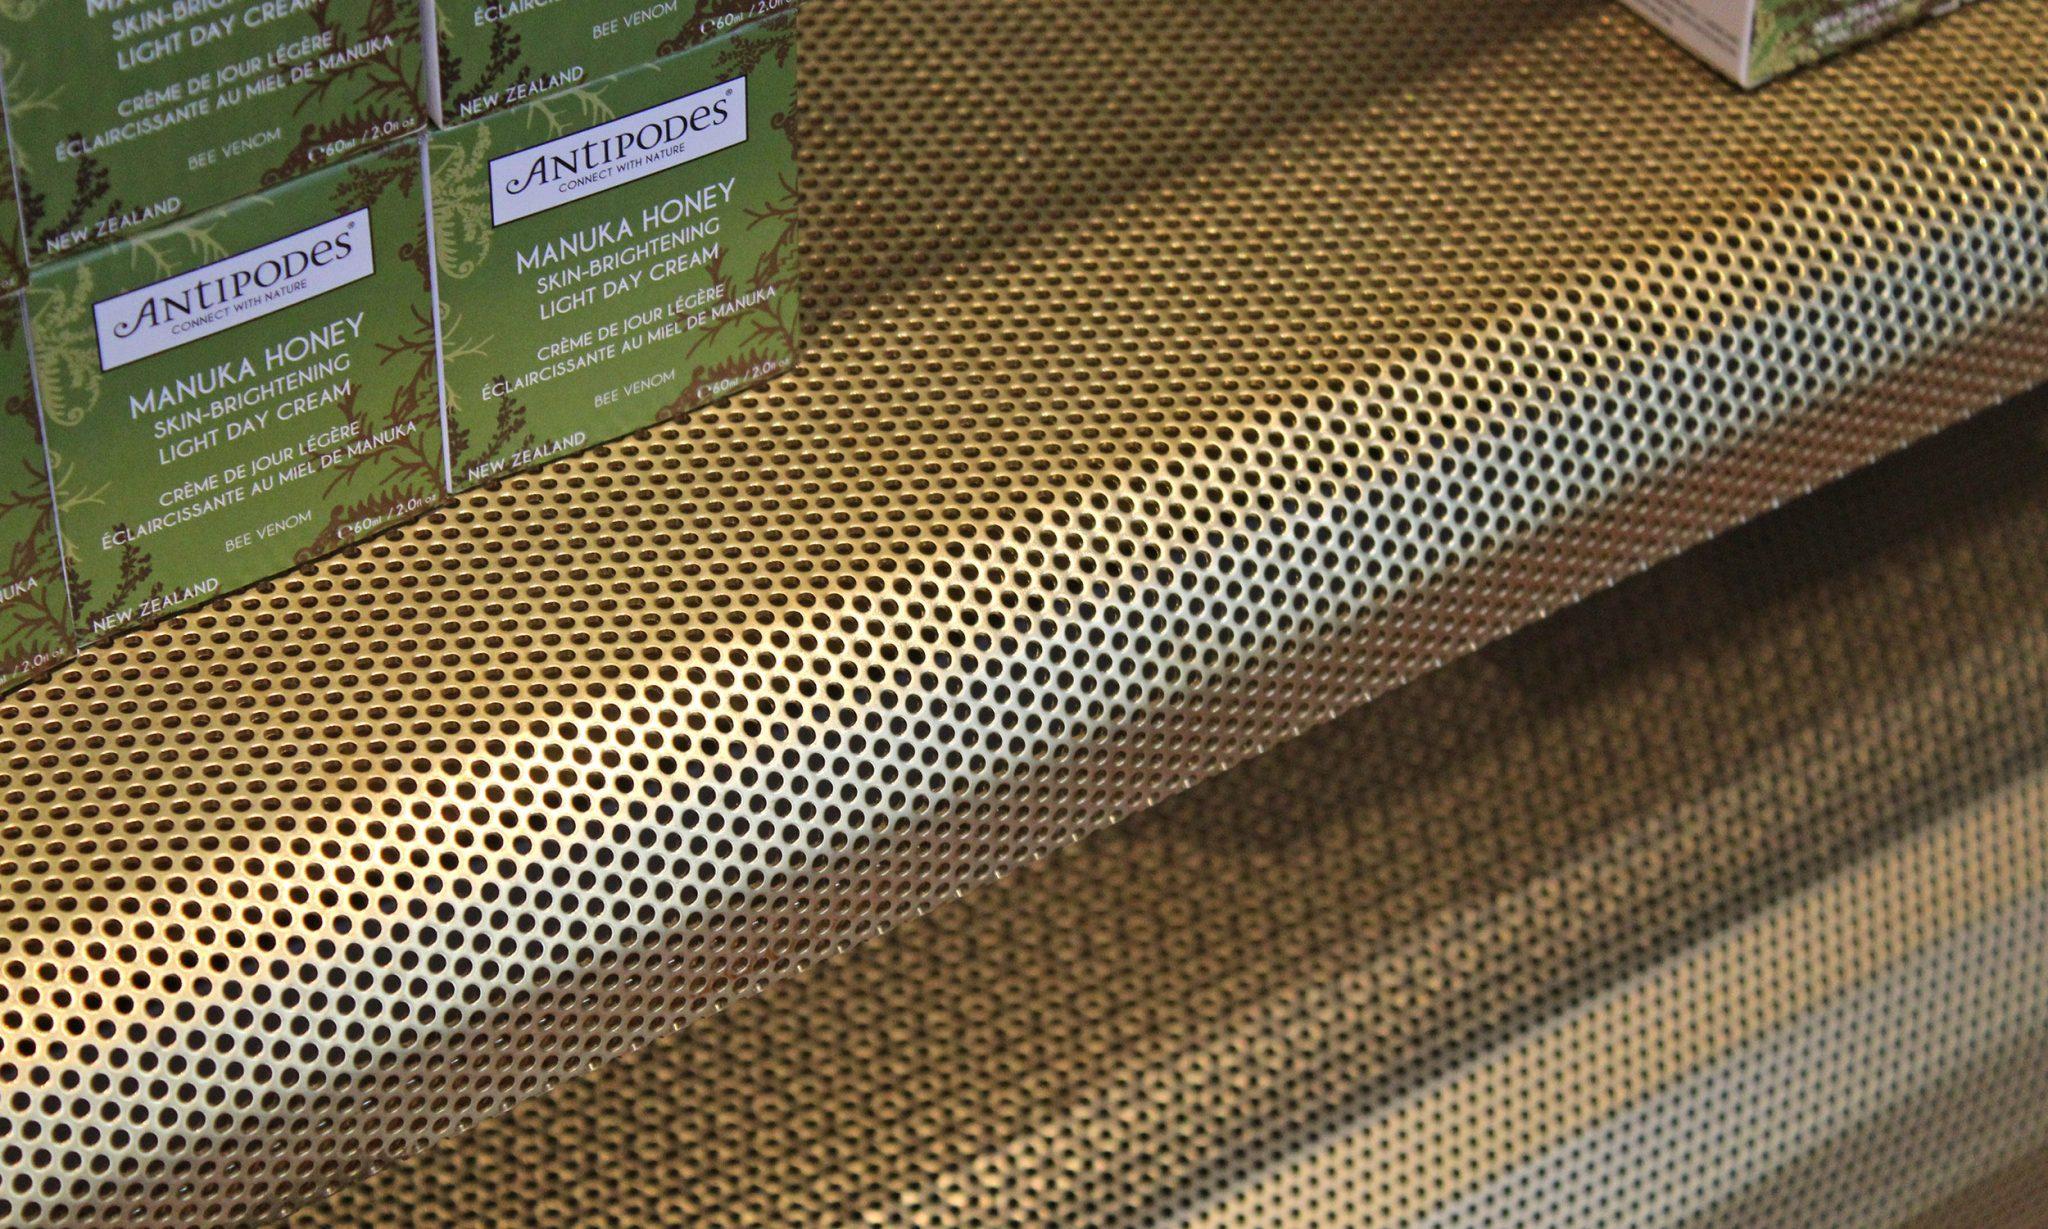 Antipodes Perforated Display 03